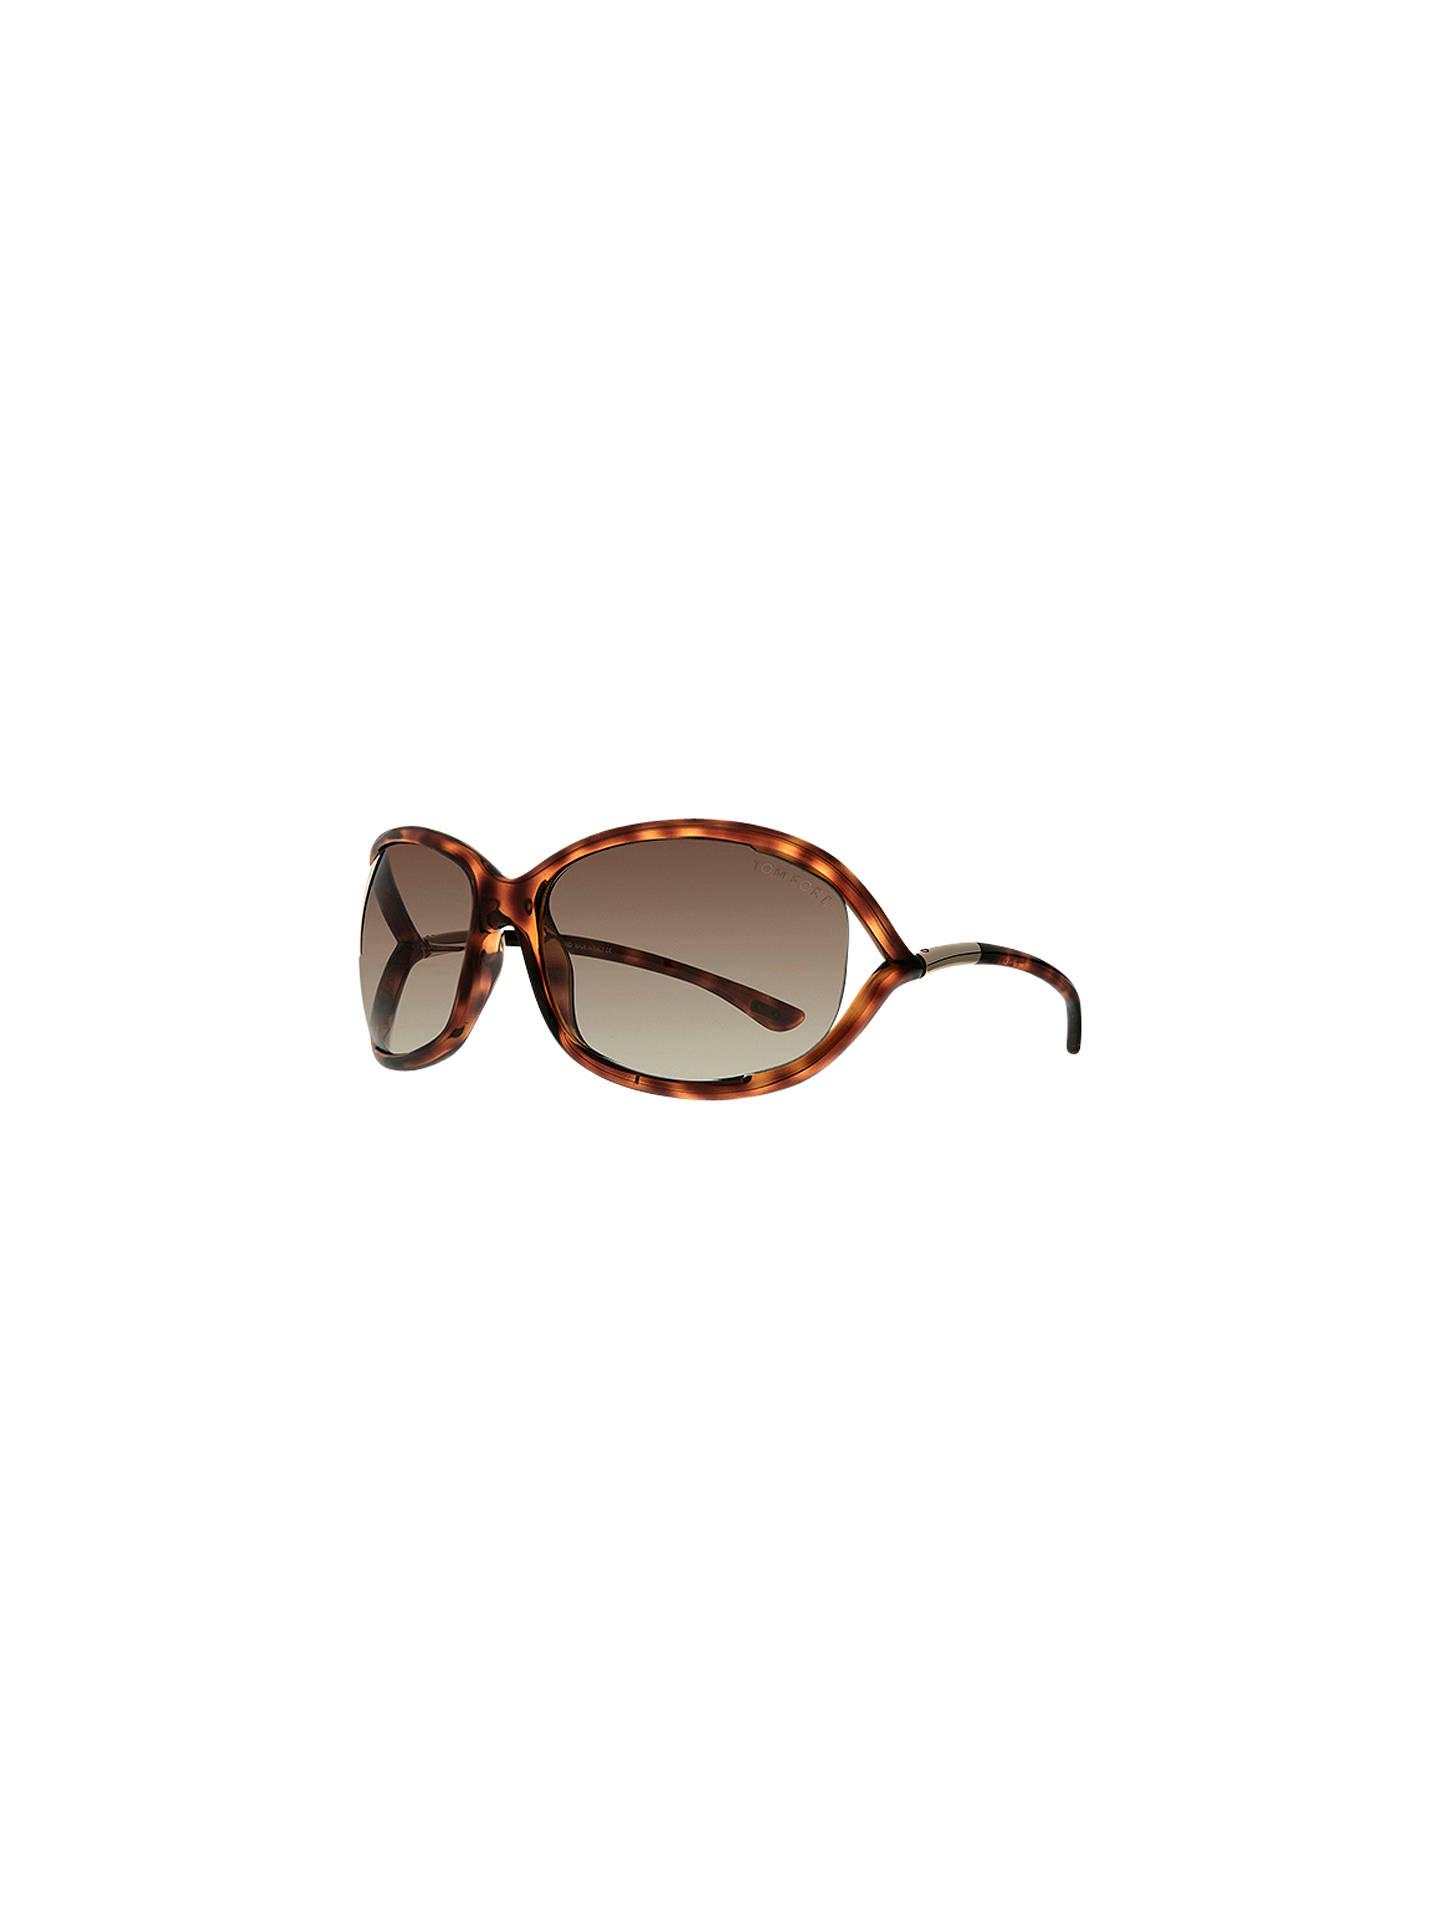 273956d3fef Buy TOM FORD FT0008 Jennifer Square Sunglasses